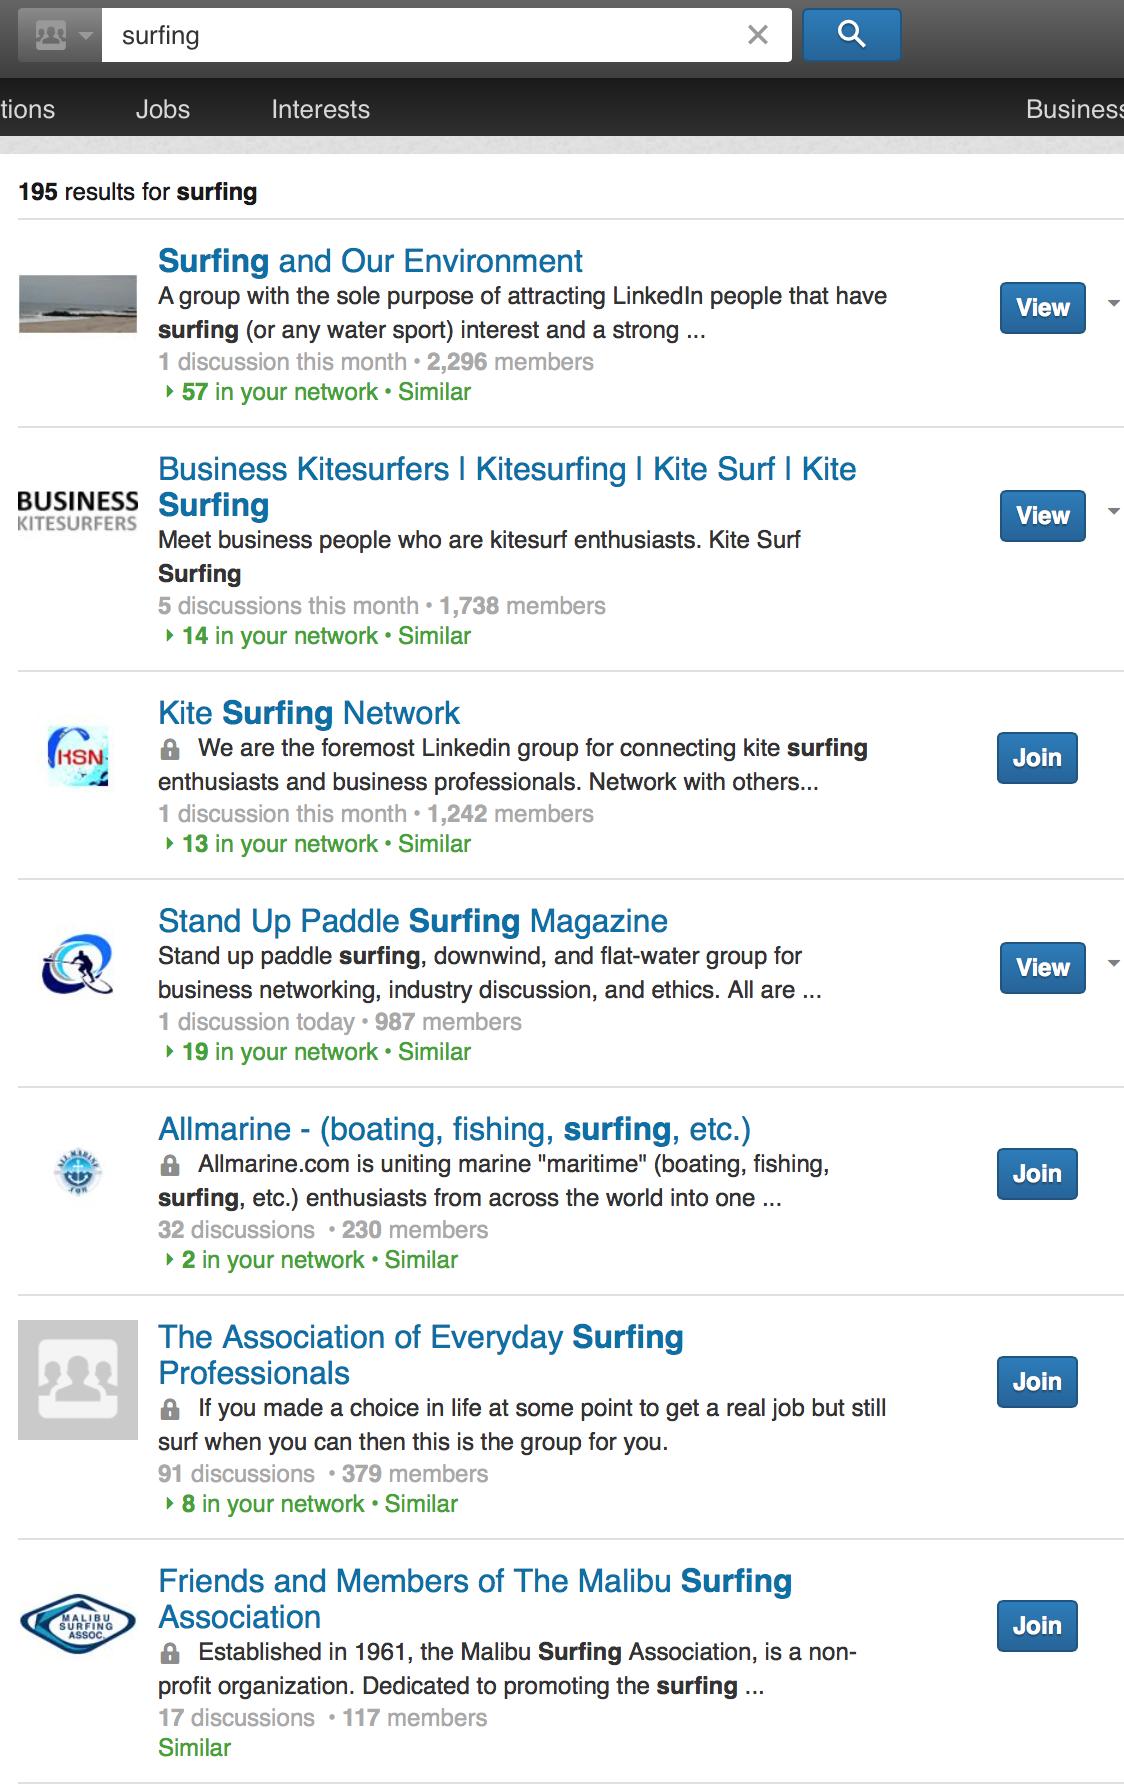 linkedin+surfing+groups.png